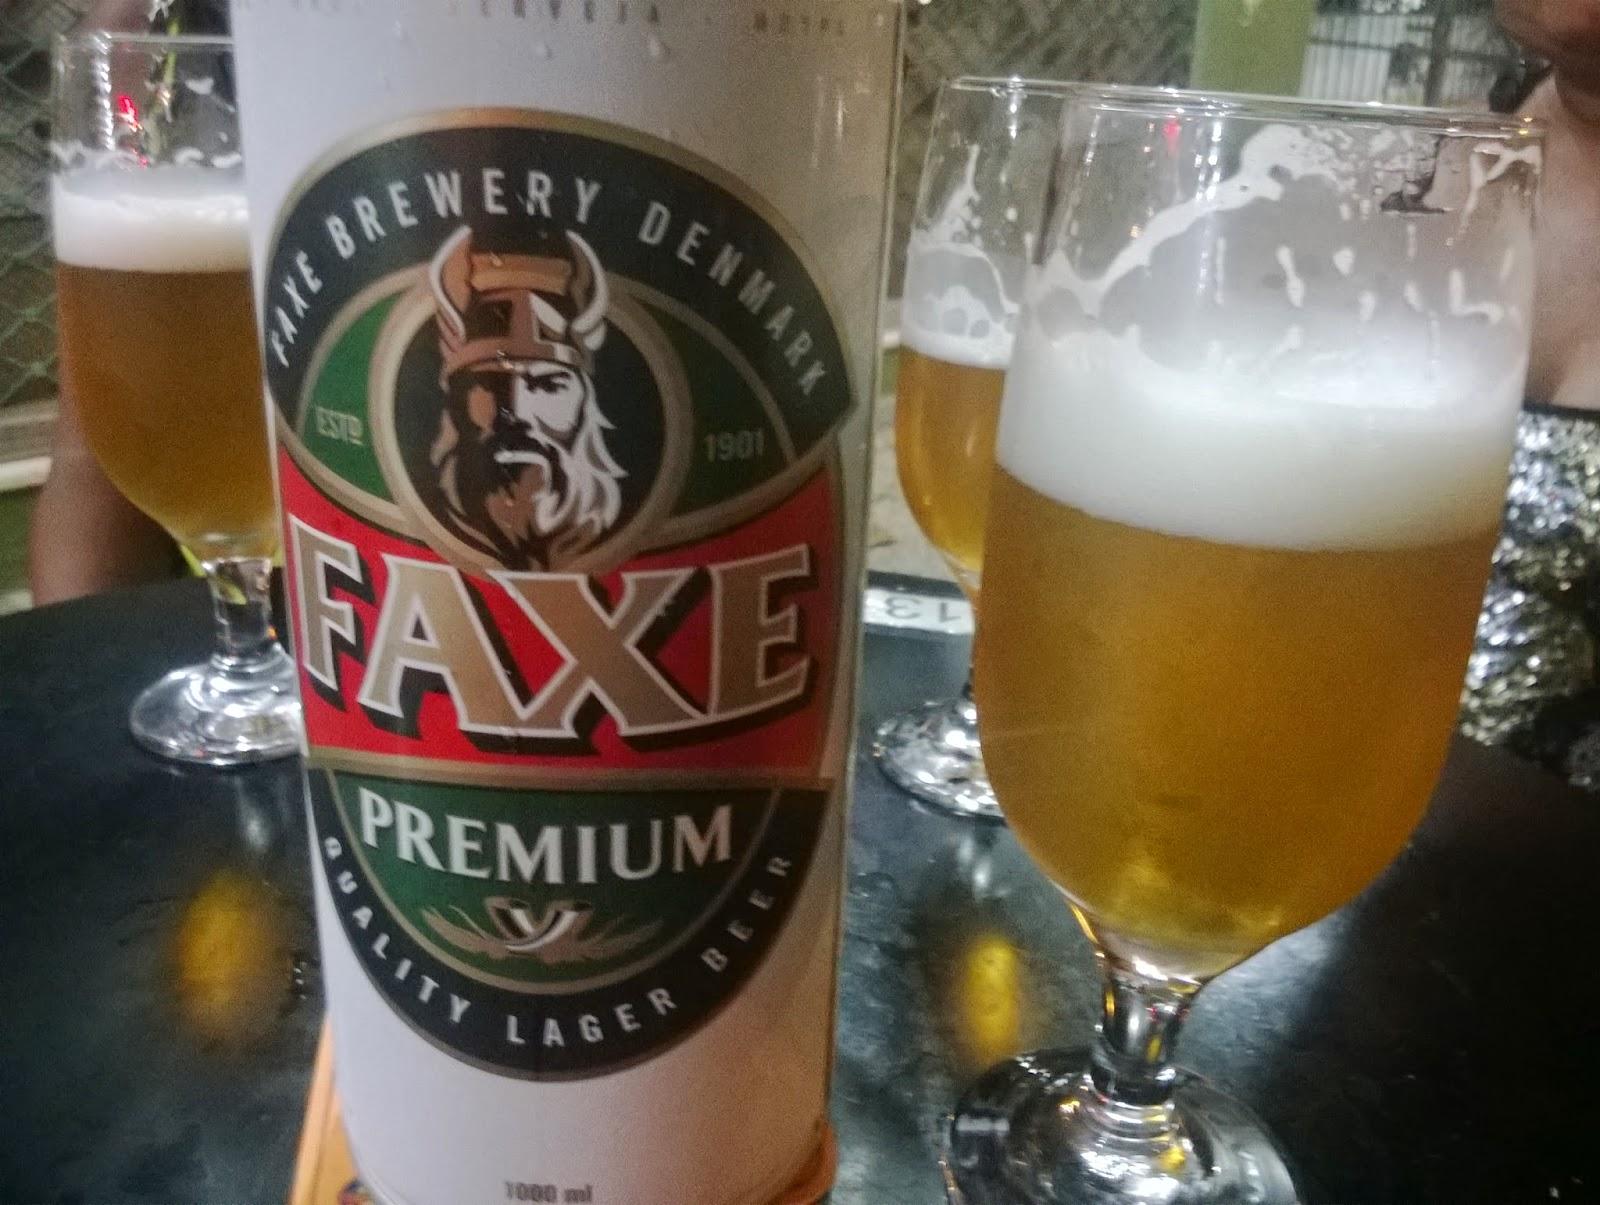 Faxe_Premium_20140207_005.jpg